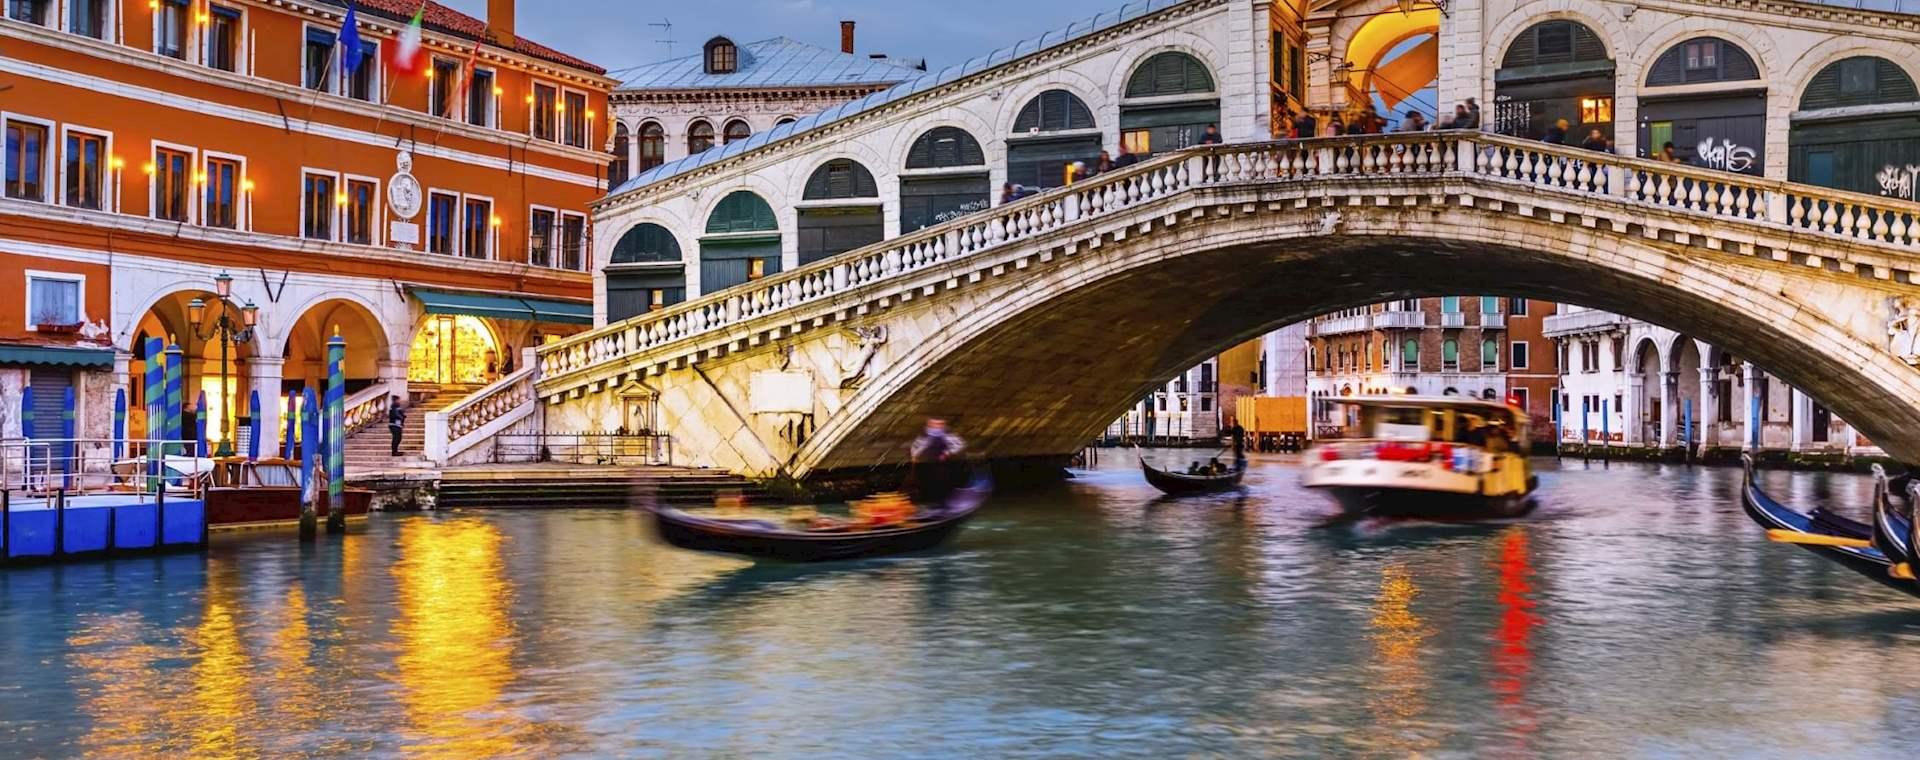 Full-Day Combo: Best of Venice & Venetian Islands Tour